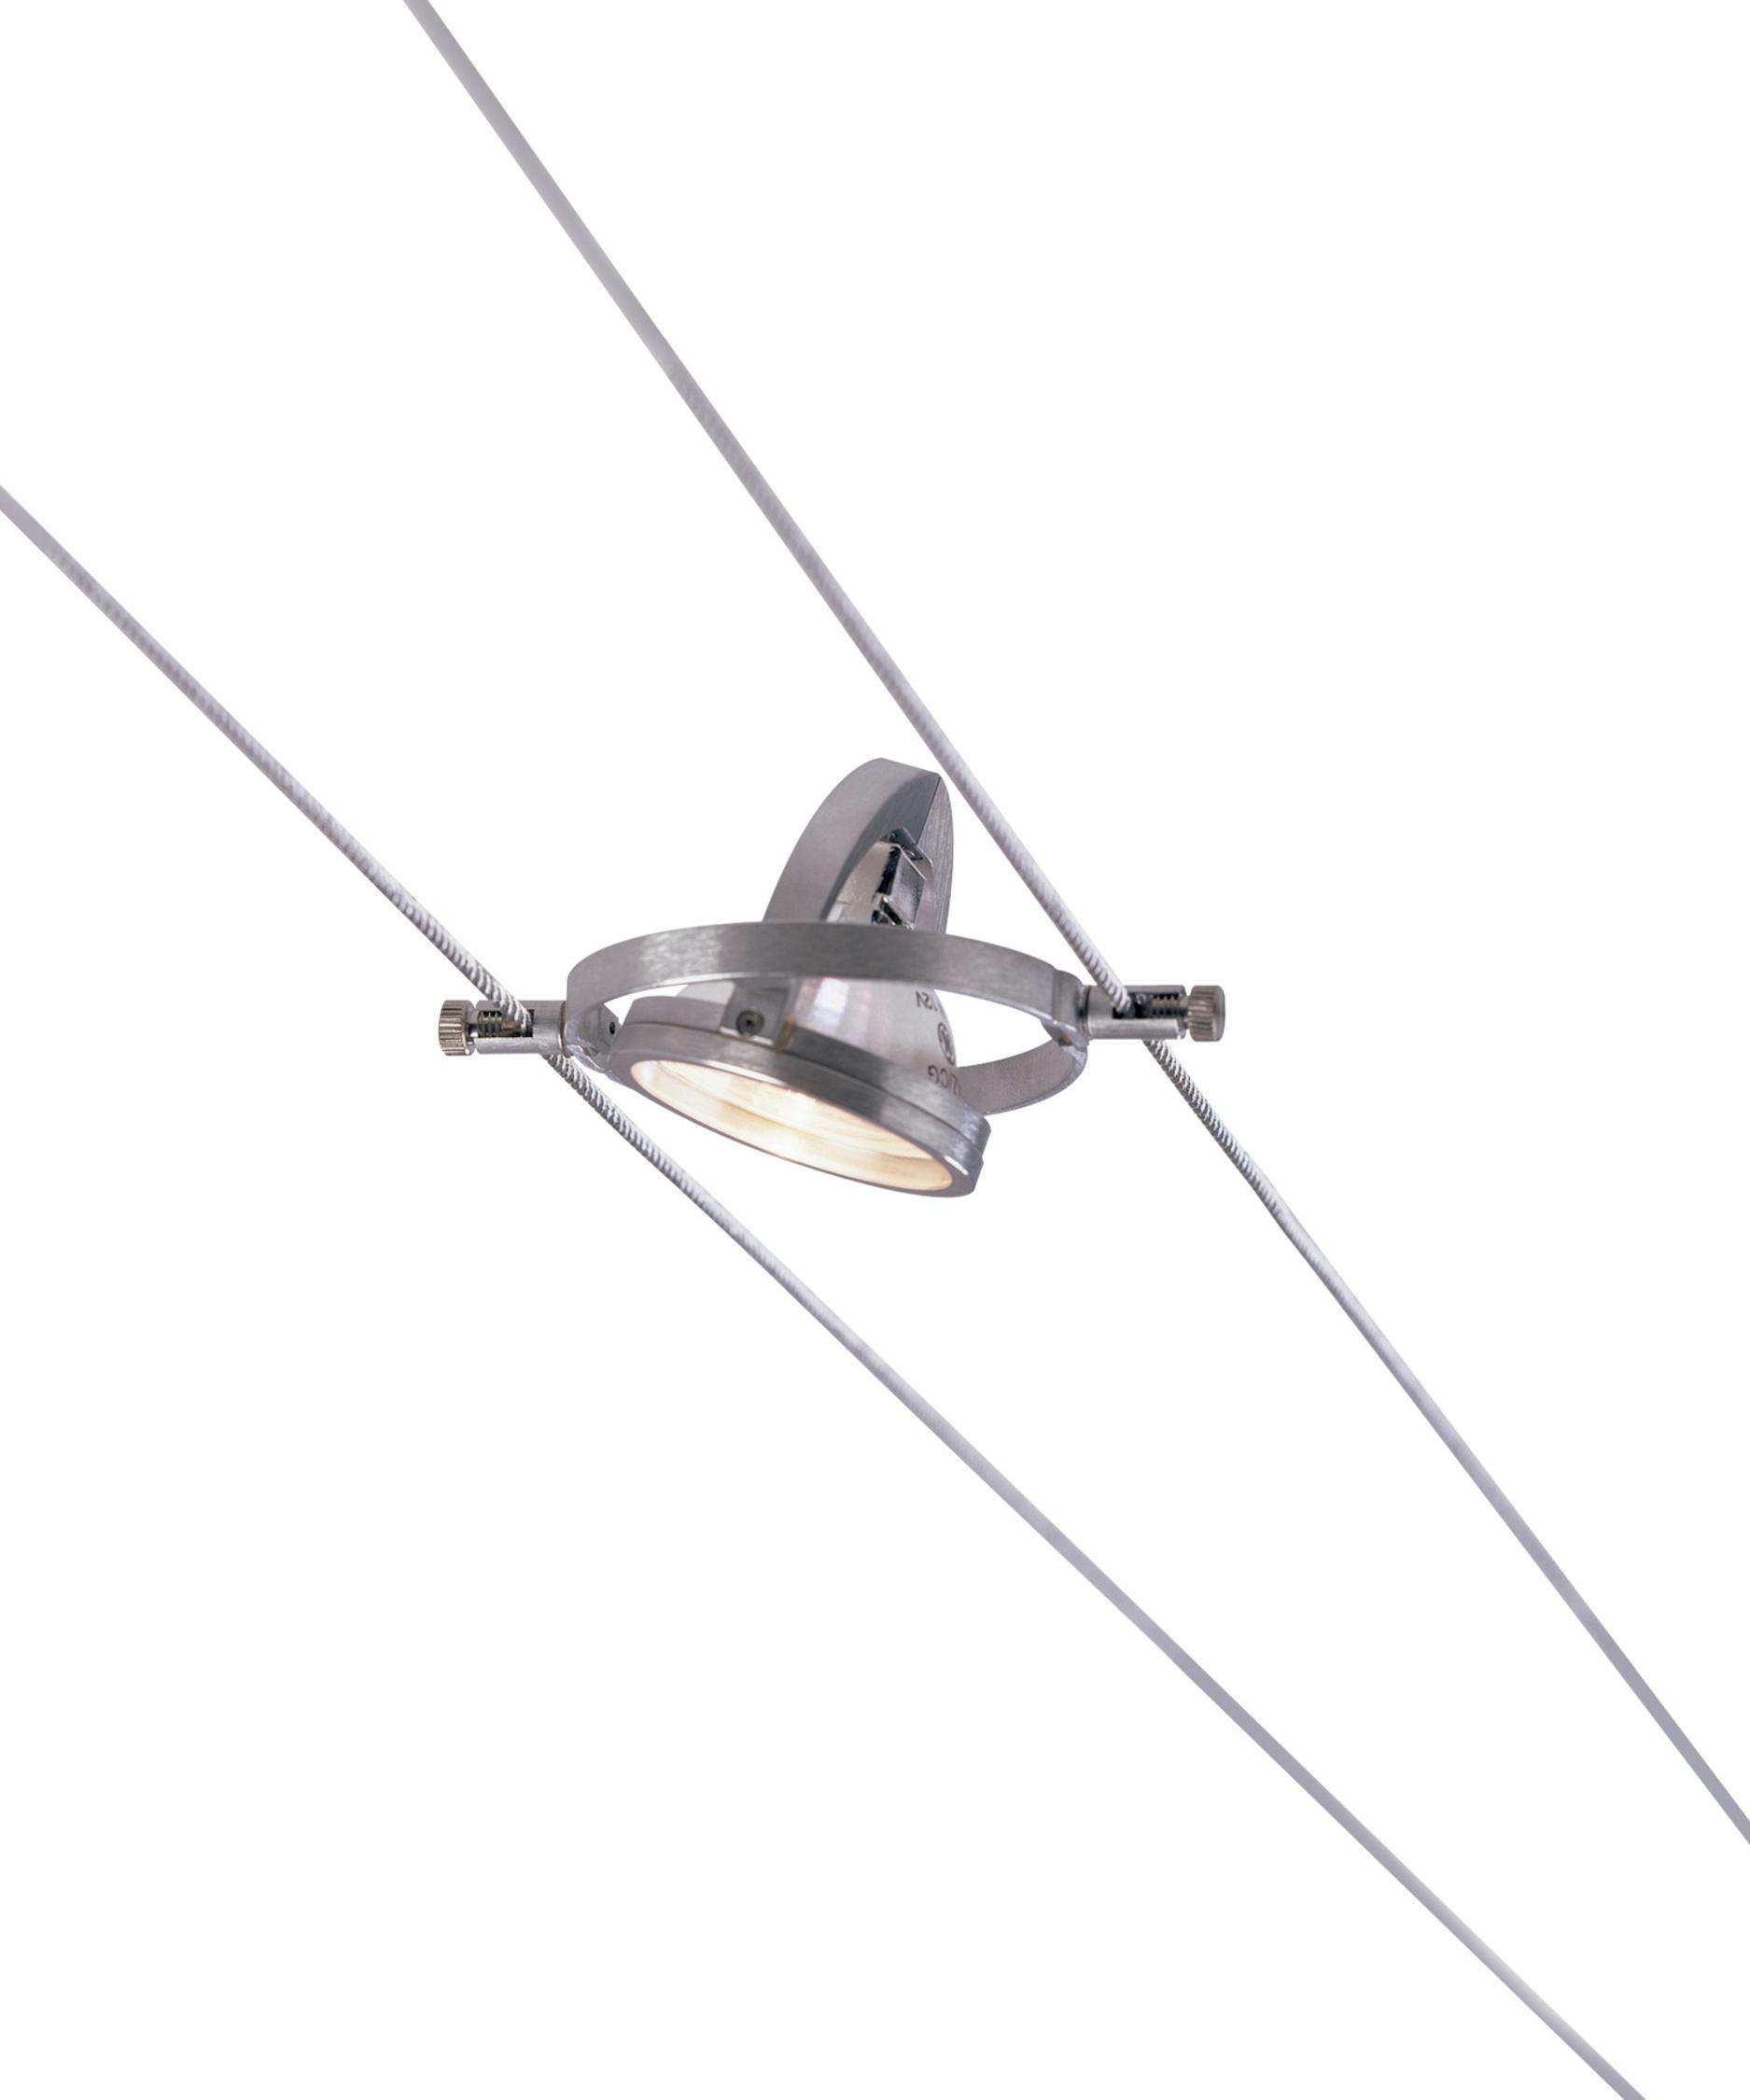 Tech Lighting K-Hello 4 Inch Cable Fixture | Capitol Lighting 1 ...:Shown in Satin Aluminum finish,Lighting